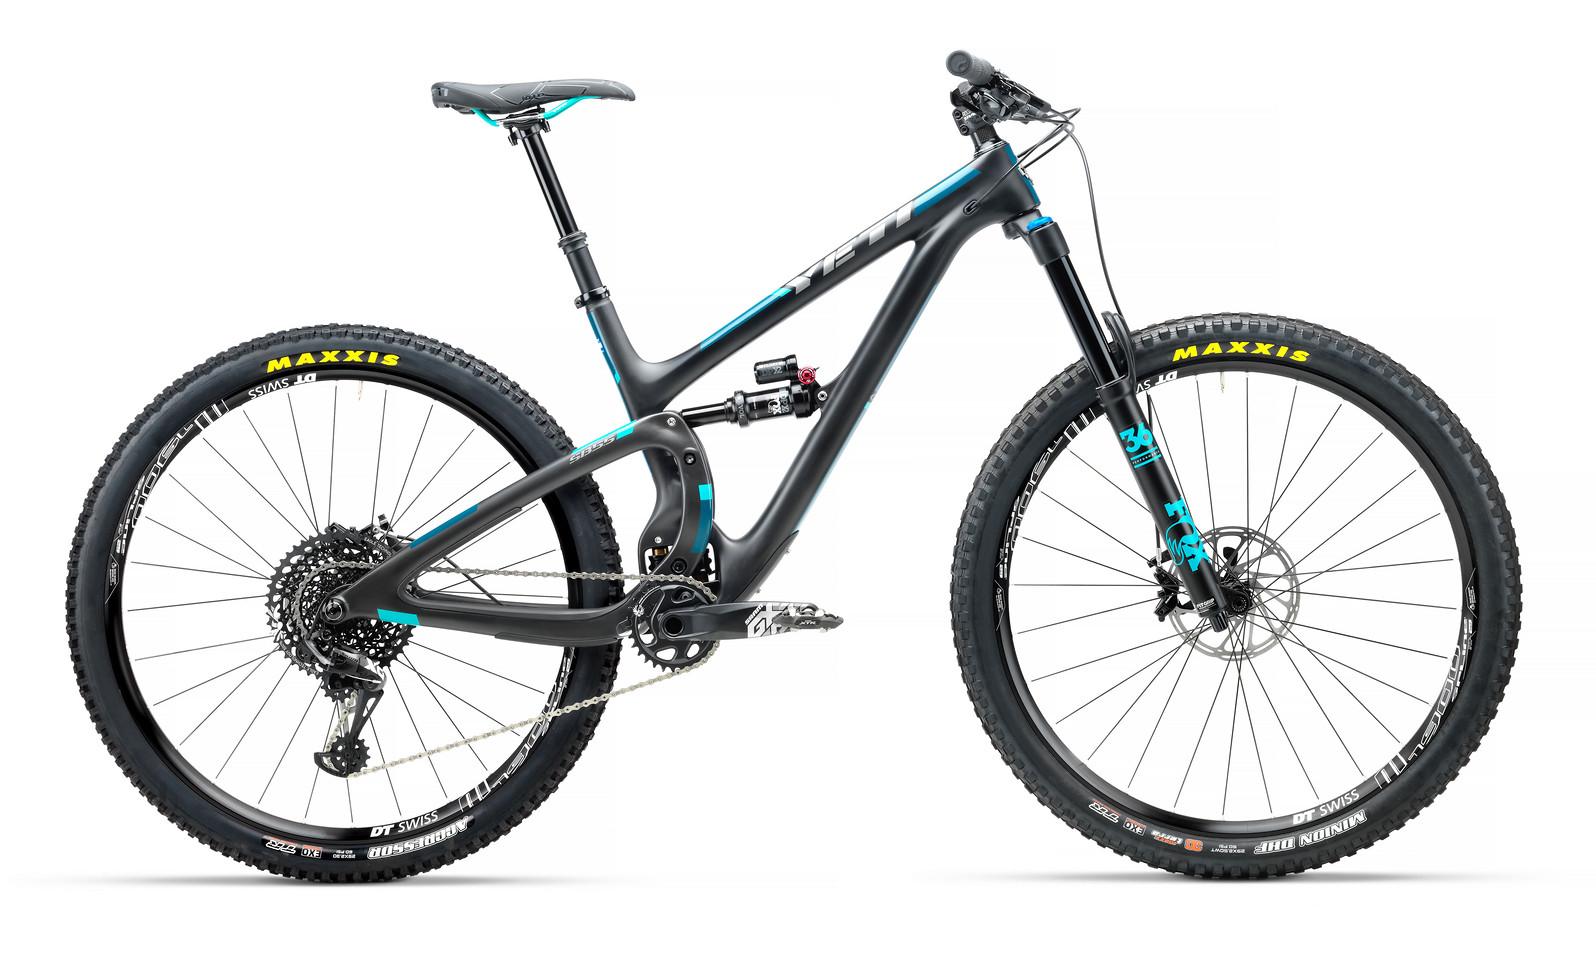 2018 Yeti SB5.5 Carbon GX Eagle Bike 2018_Yeti_SB5.5_Carbon_GX_Eagle_black